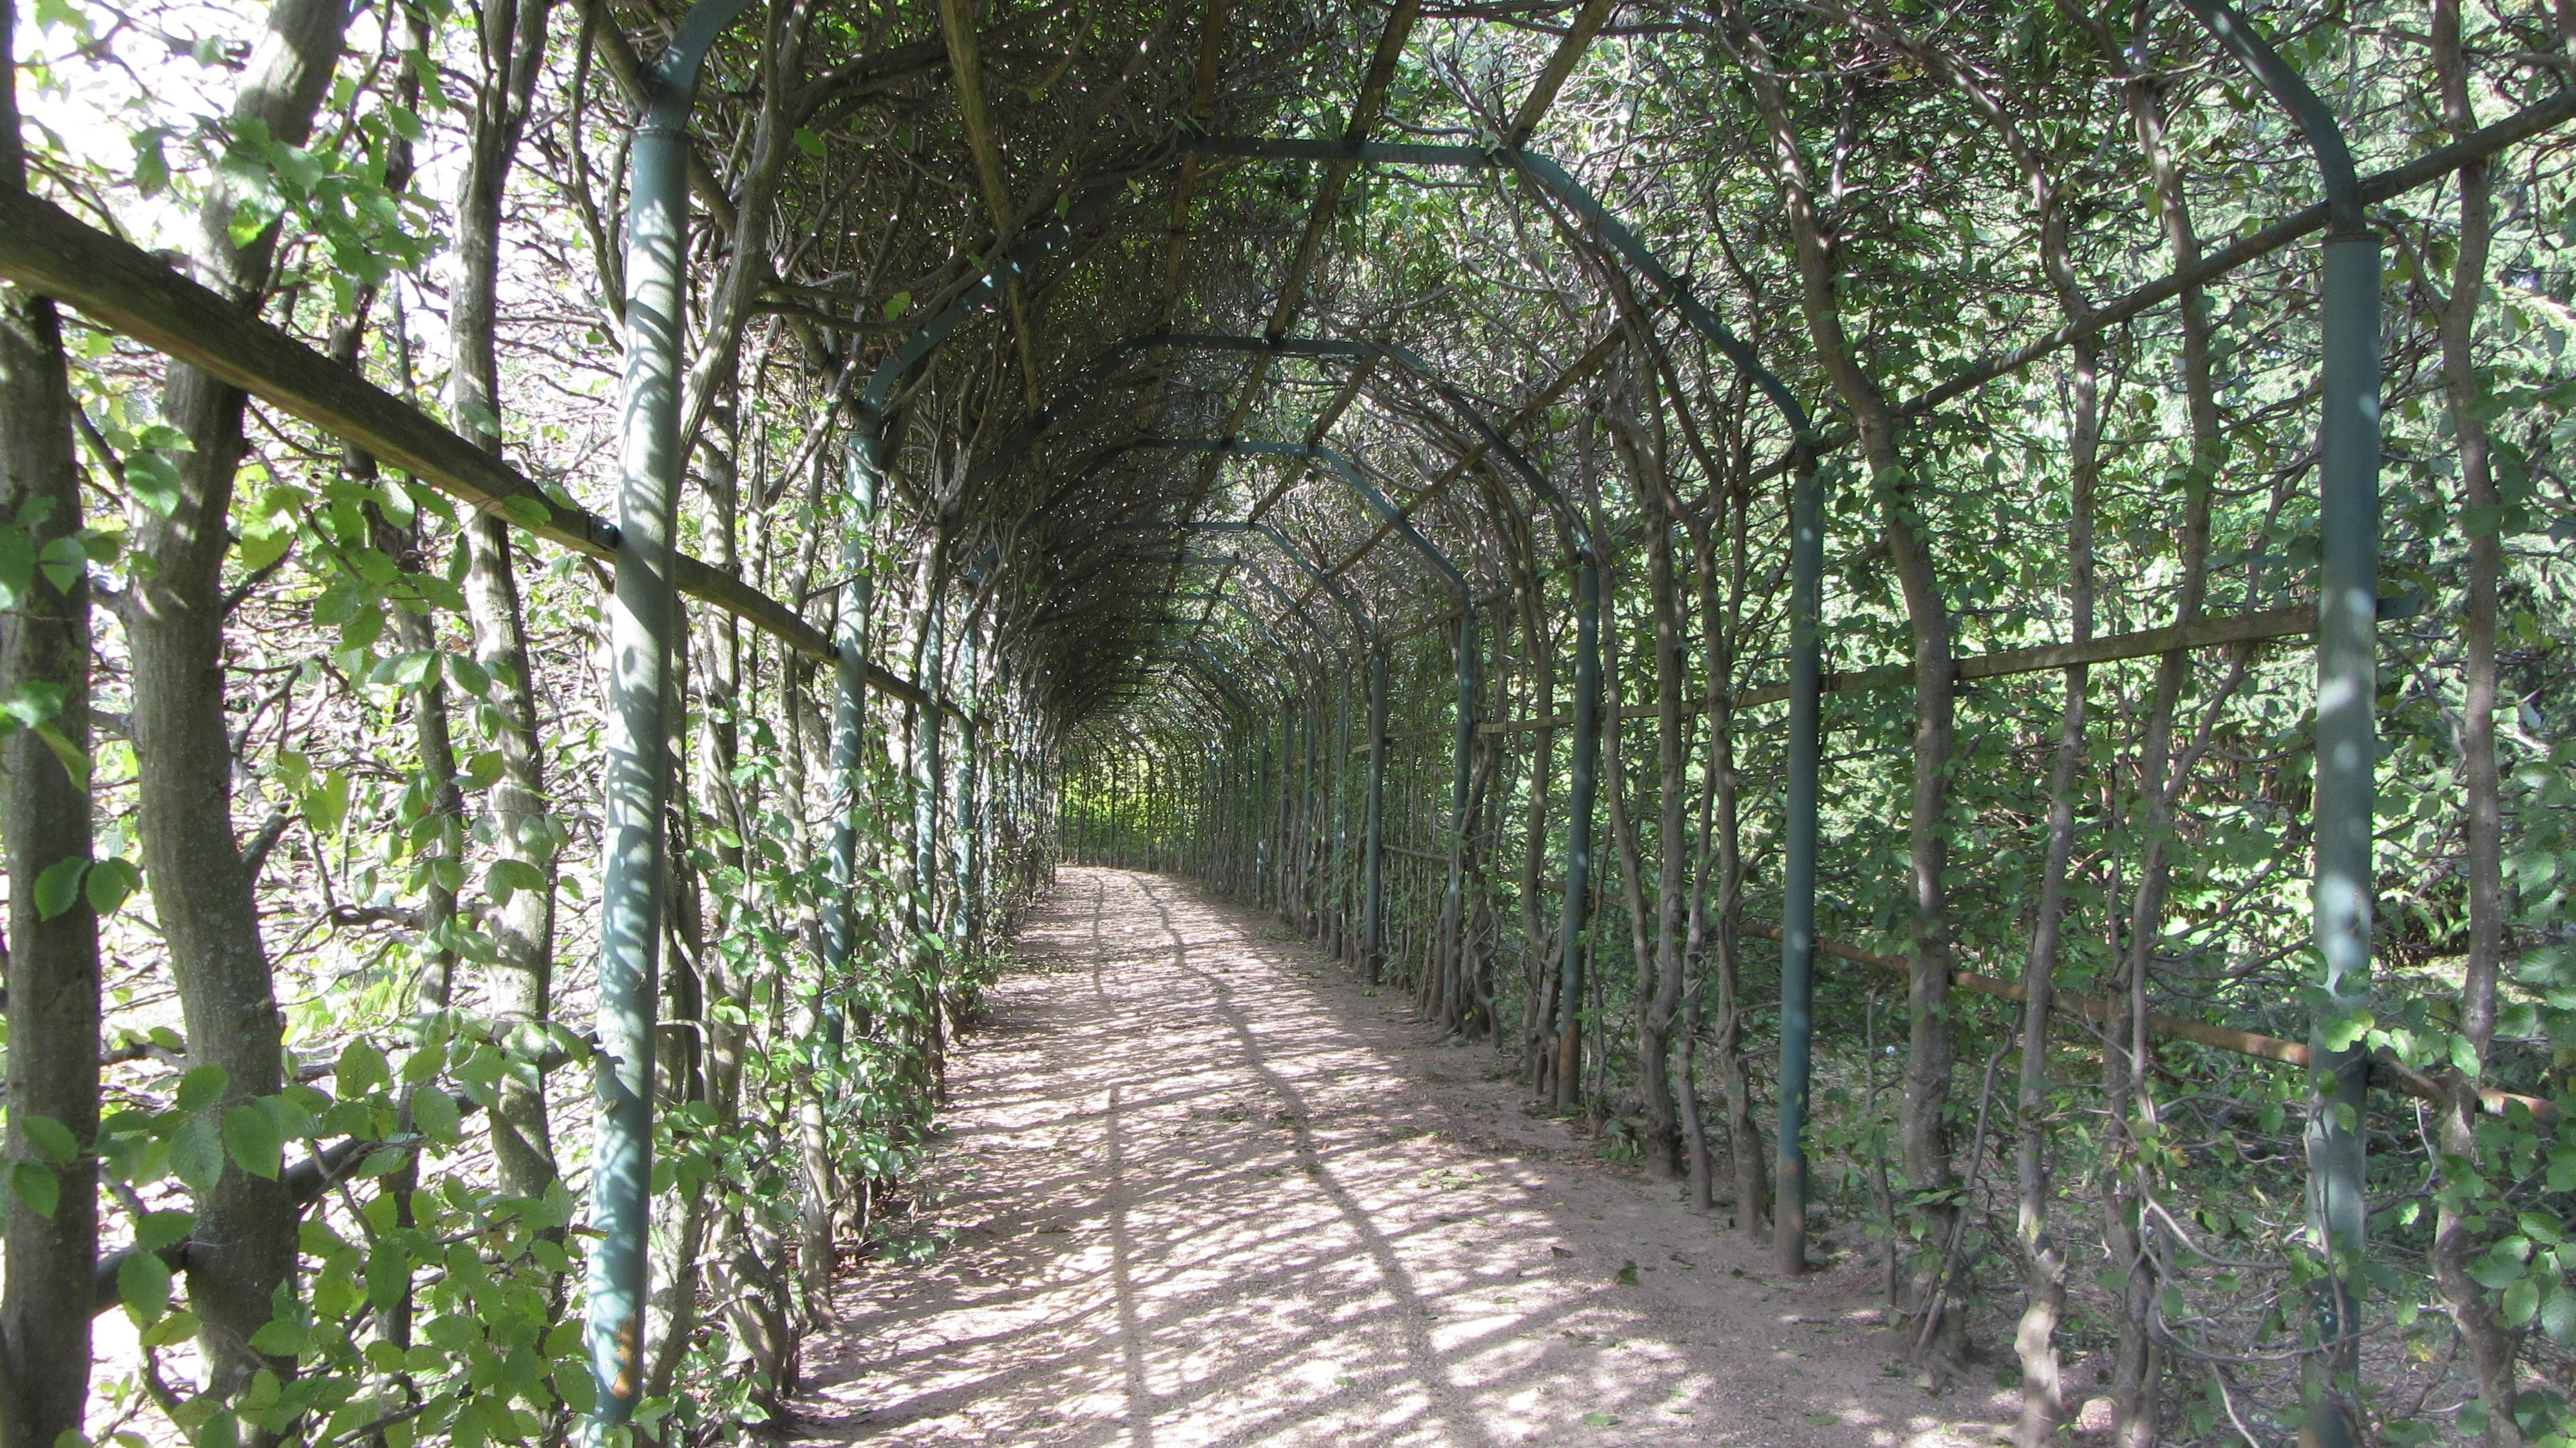 free images tree forest fence trail jungle park shrub plantation portico woodland. Black Bedroom Furniture Sets. Home Design Ideas